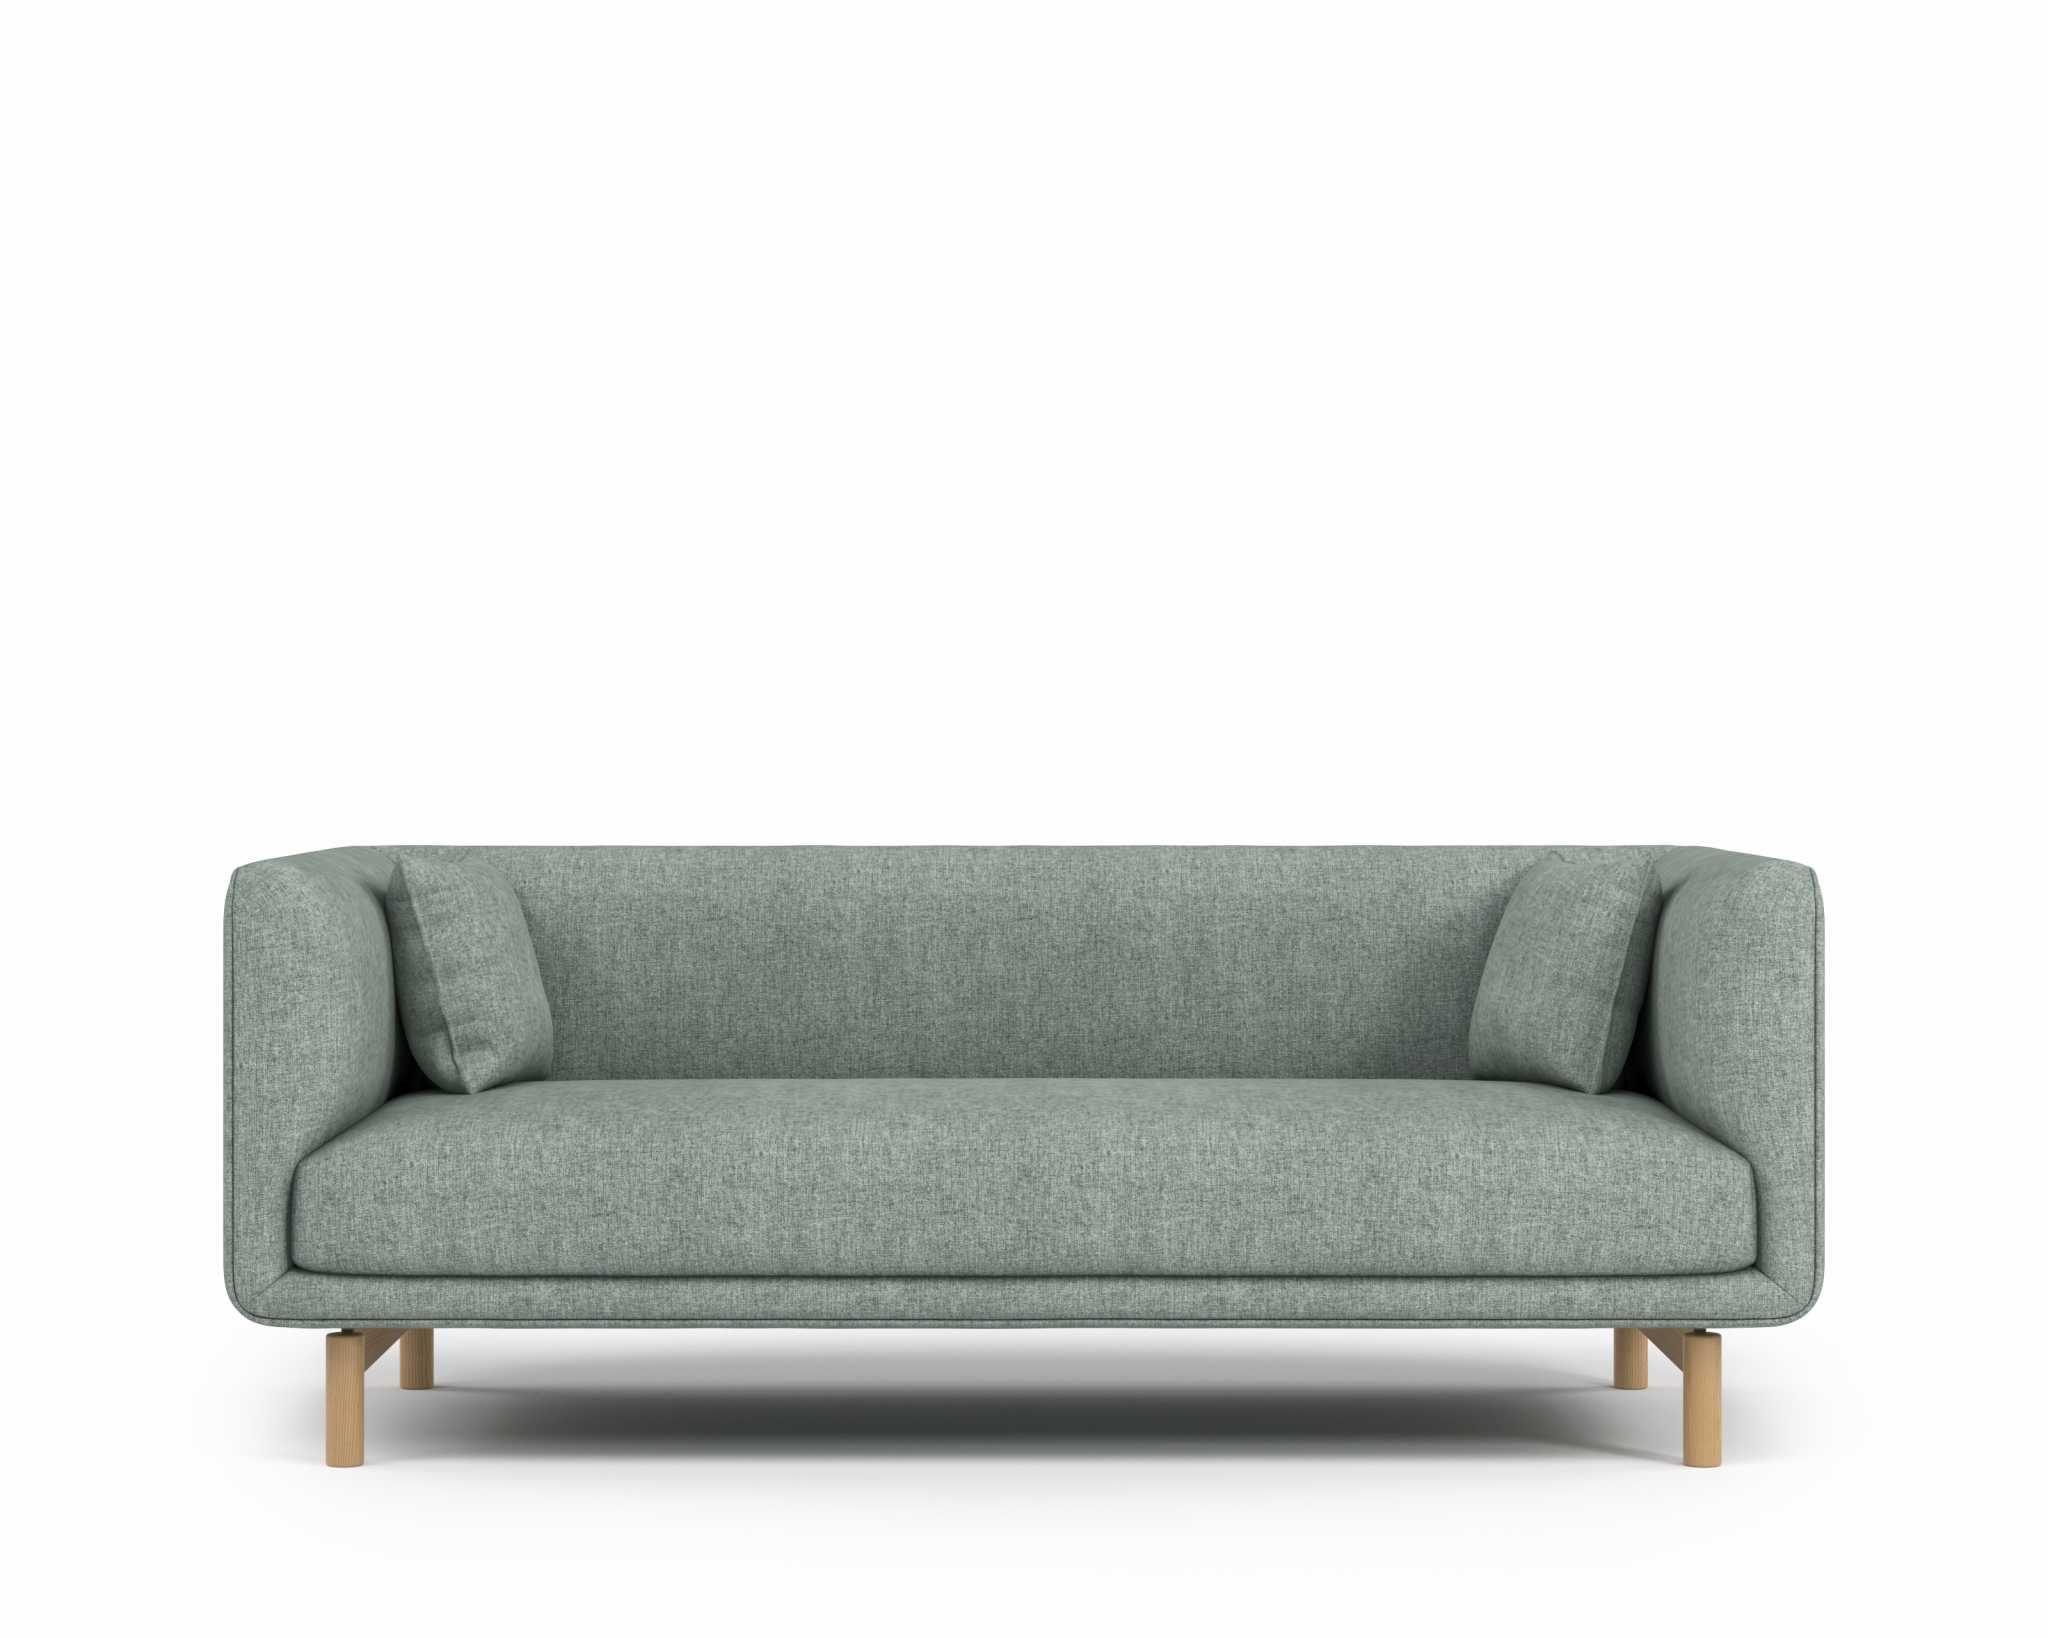 Frans Sofa Rove Concepts Rove Concepts Mid Century Furniture Scandinavian Style Furniture Ikea Sofa Bed Sofa